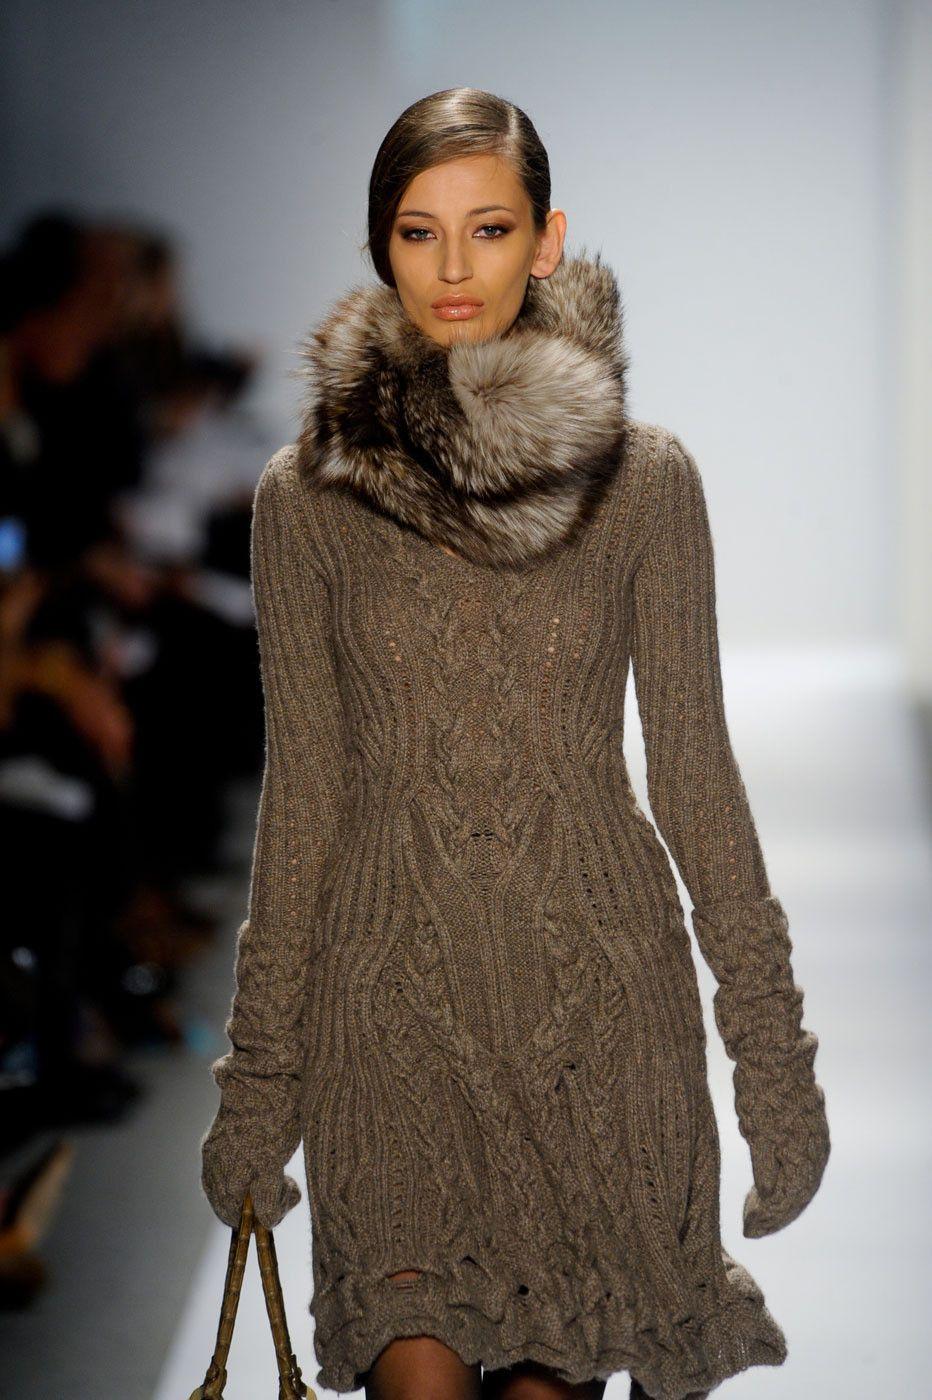 Dennis Basso at New York Fashion Week Fall 2011